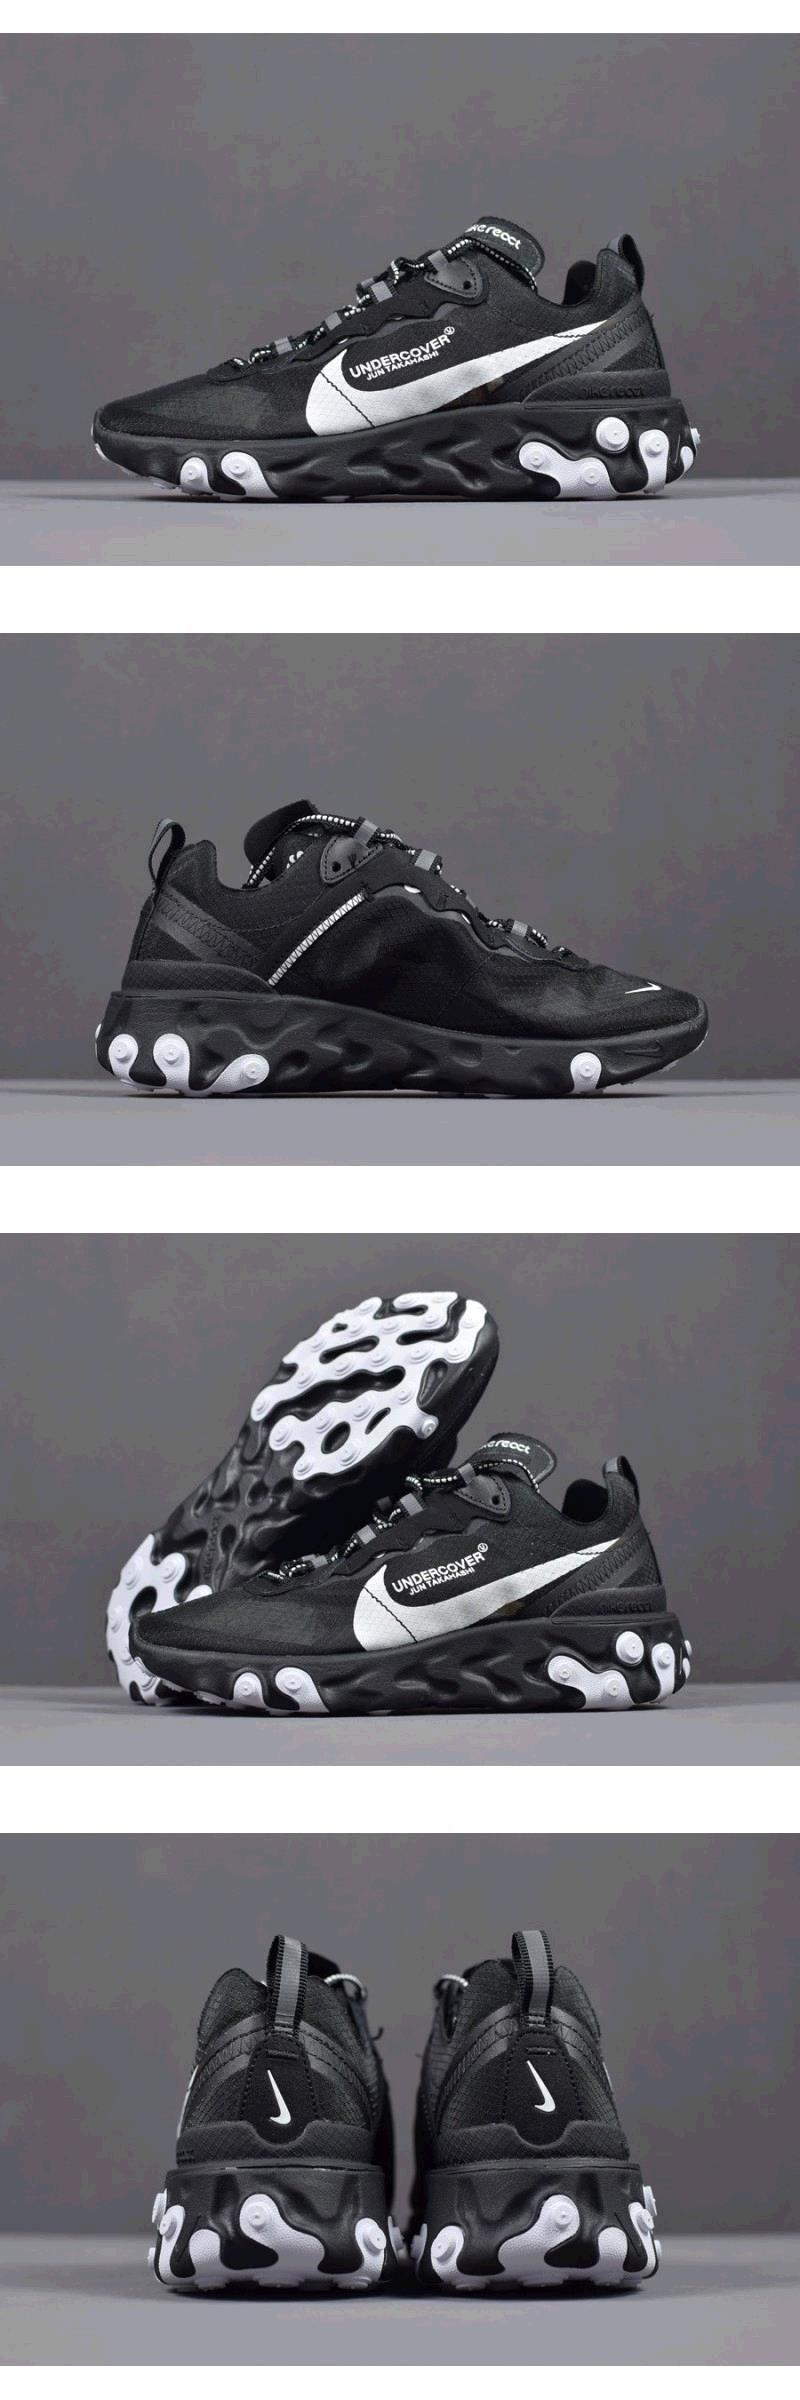 Promotion Undercover x Nike React Element 87 Black/White Running ...